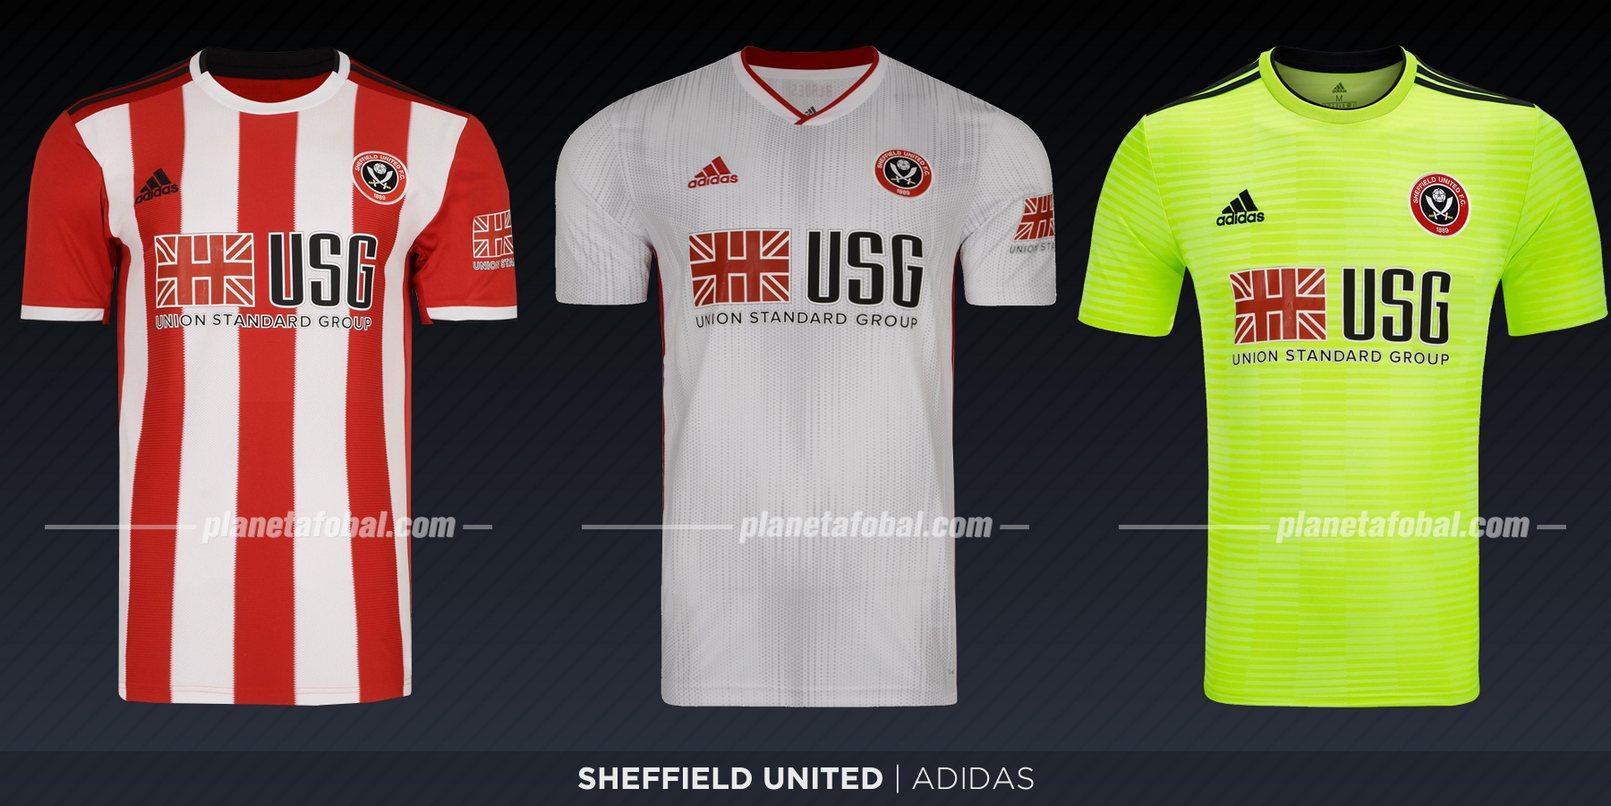 Sheffield United (Adidas) | Camisetas de la Premier League 2019-2020